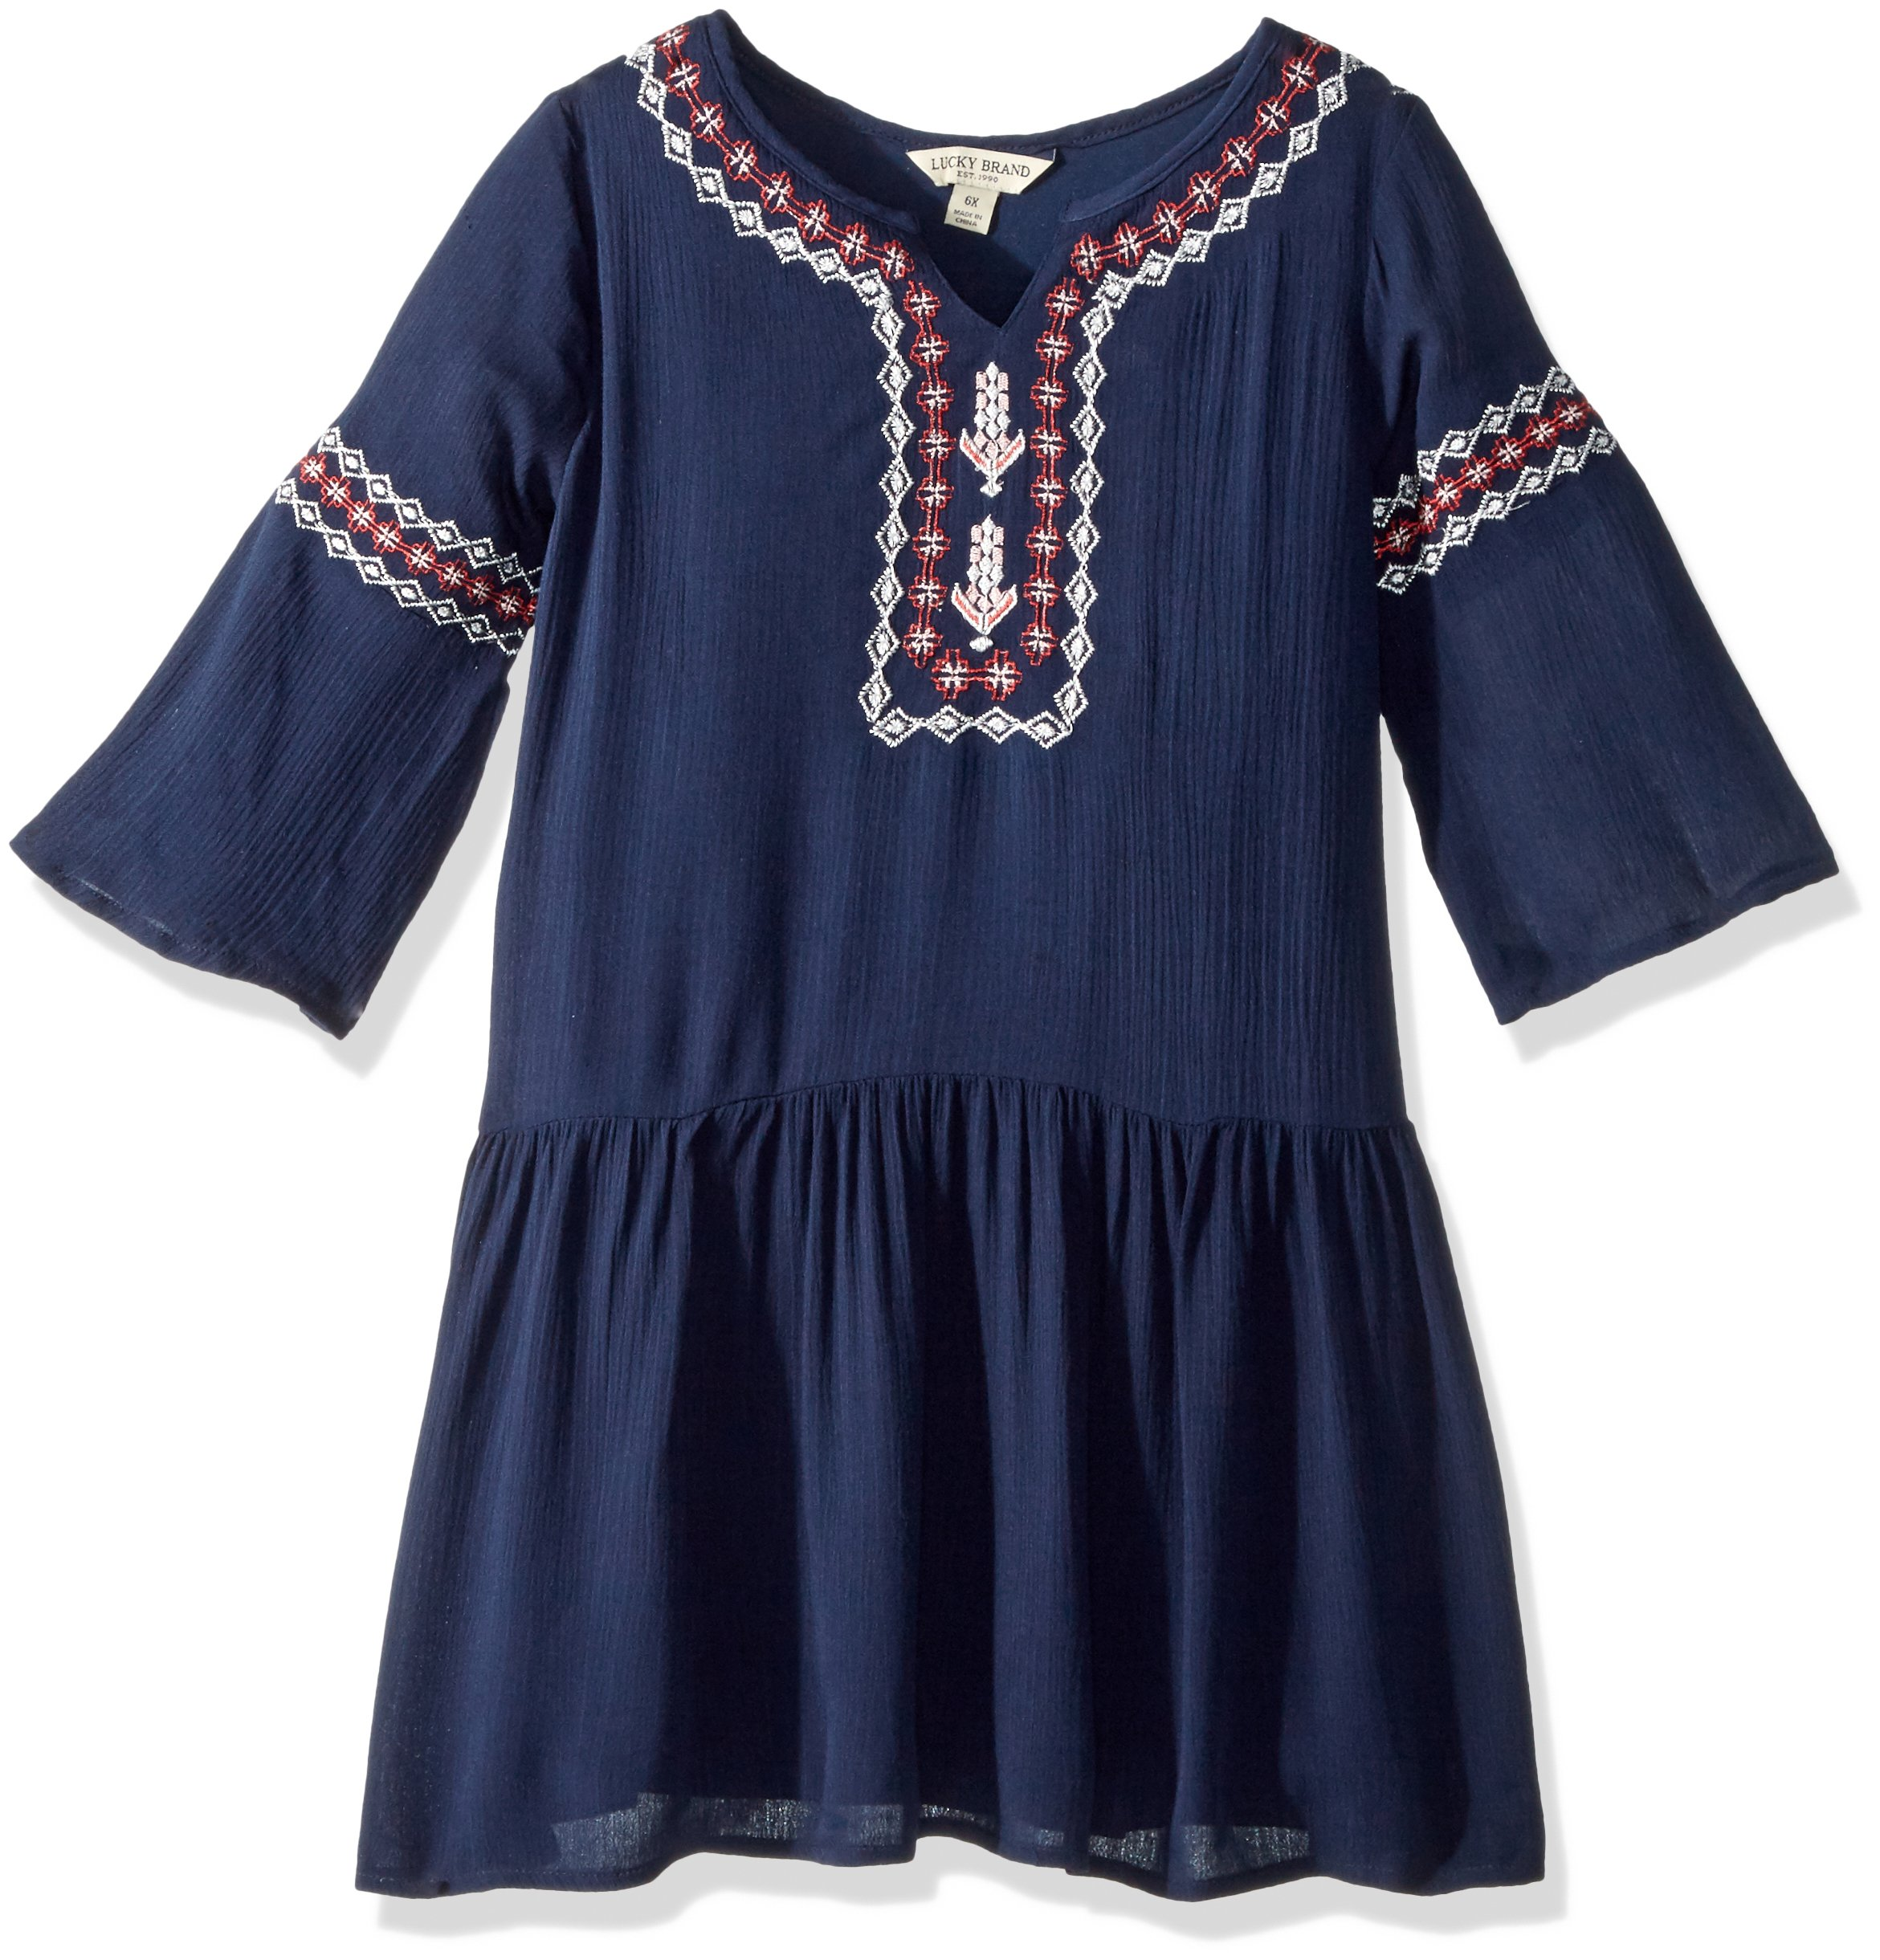 Lucky Brand Little Girls' Ellie Dress, Ellie Black Iris, 6X